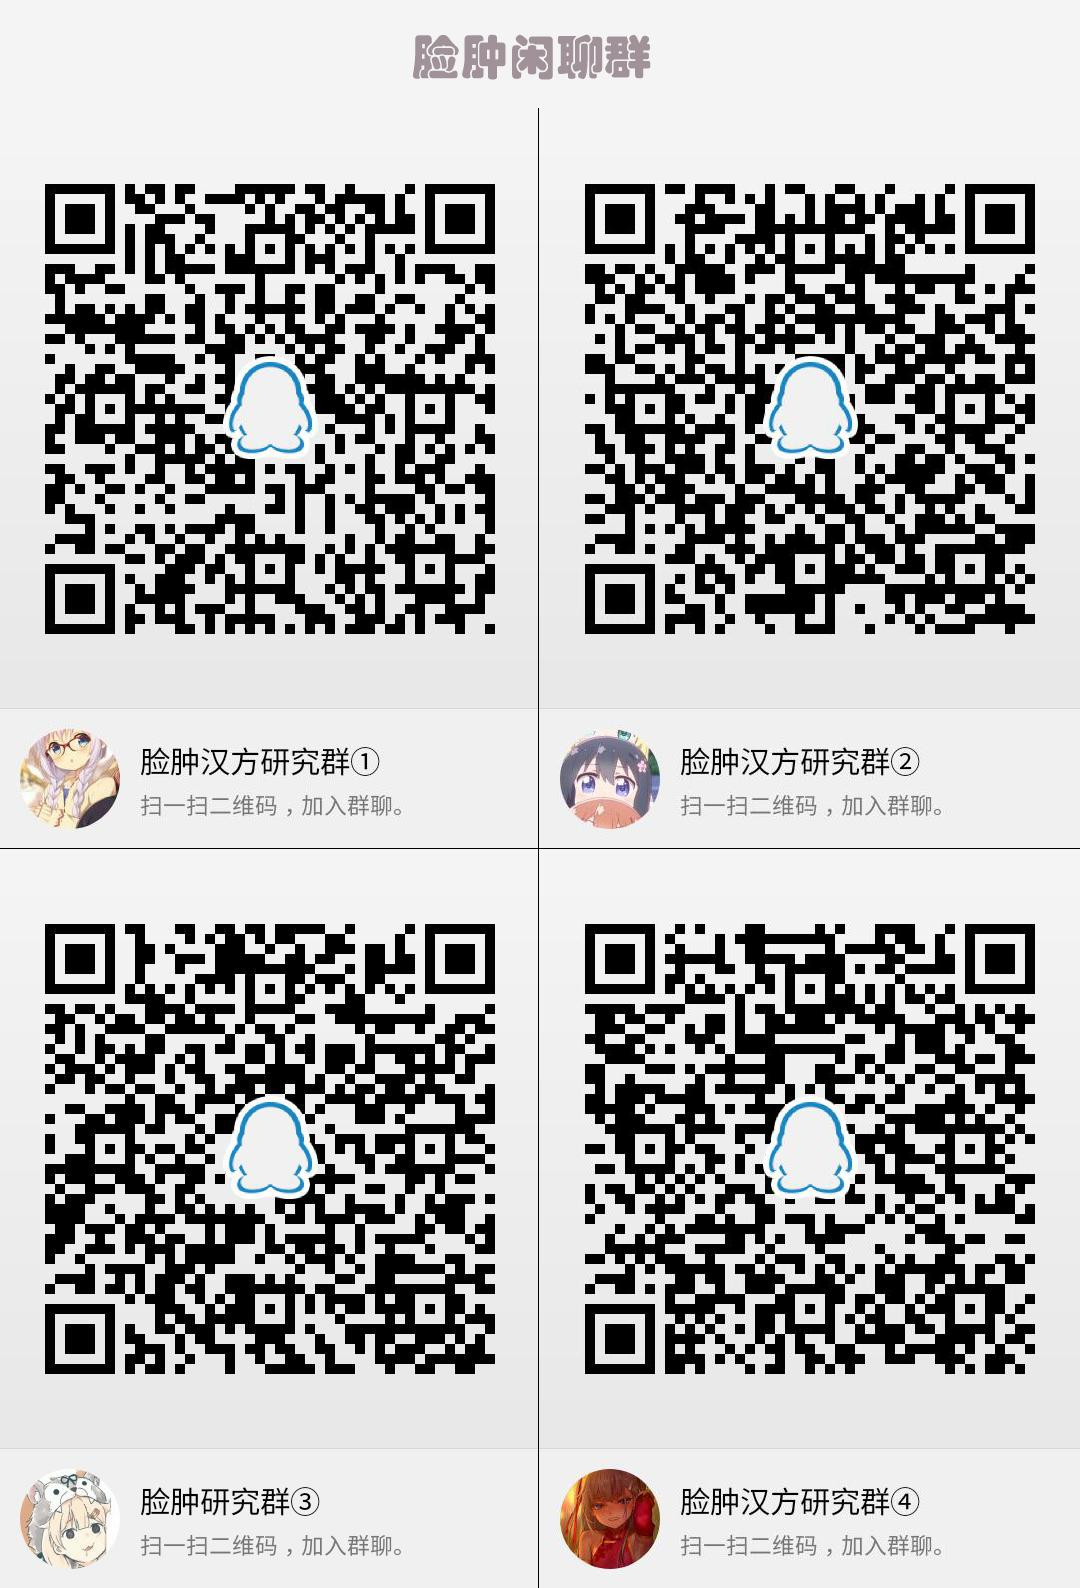 Eli-chan to Ofuro de Ecchi Suru Hon 16